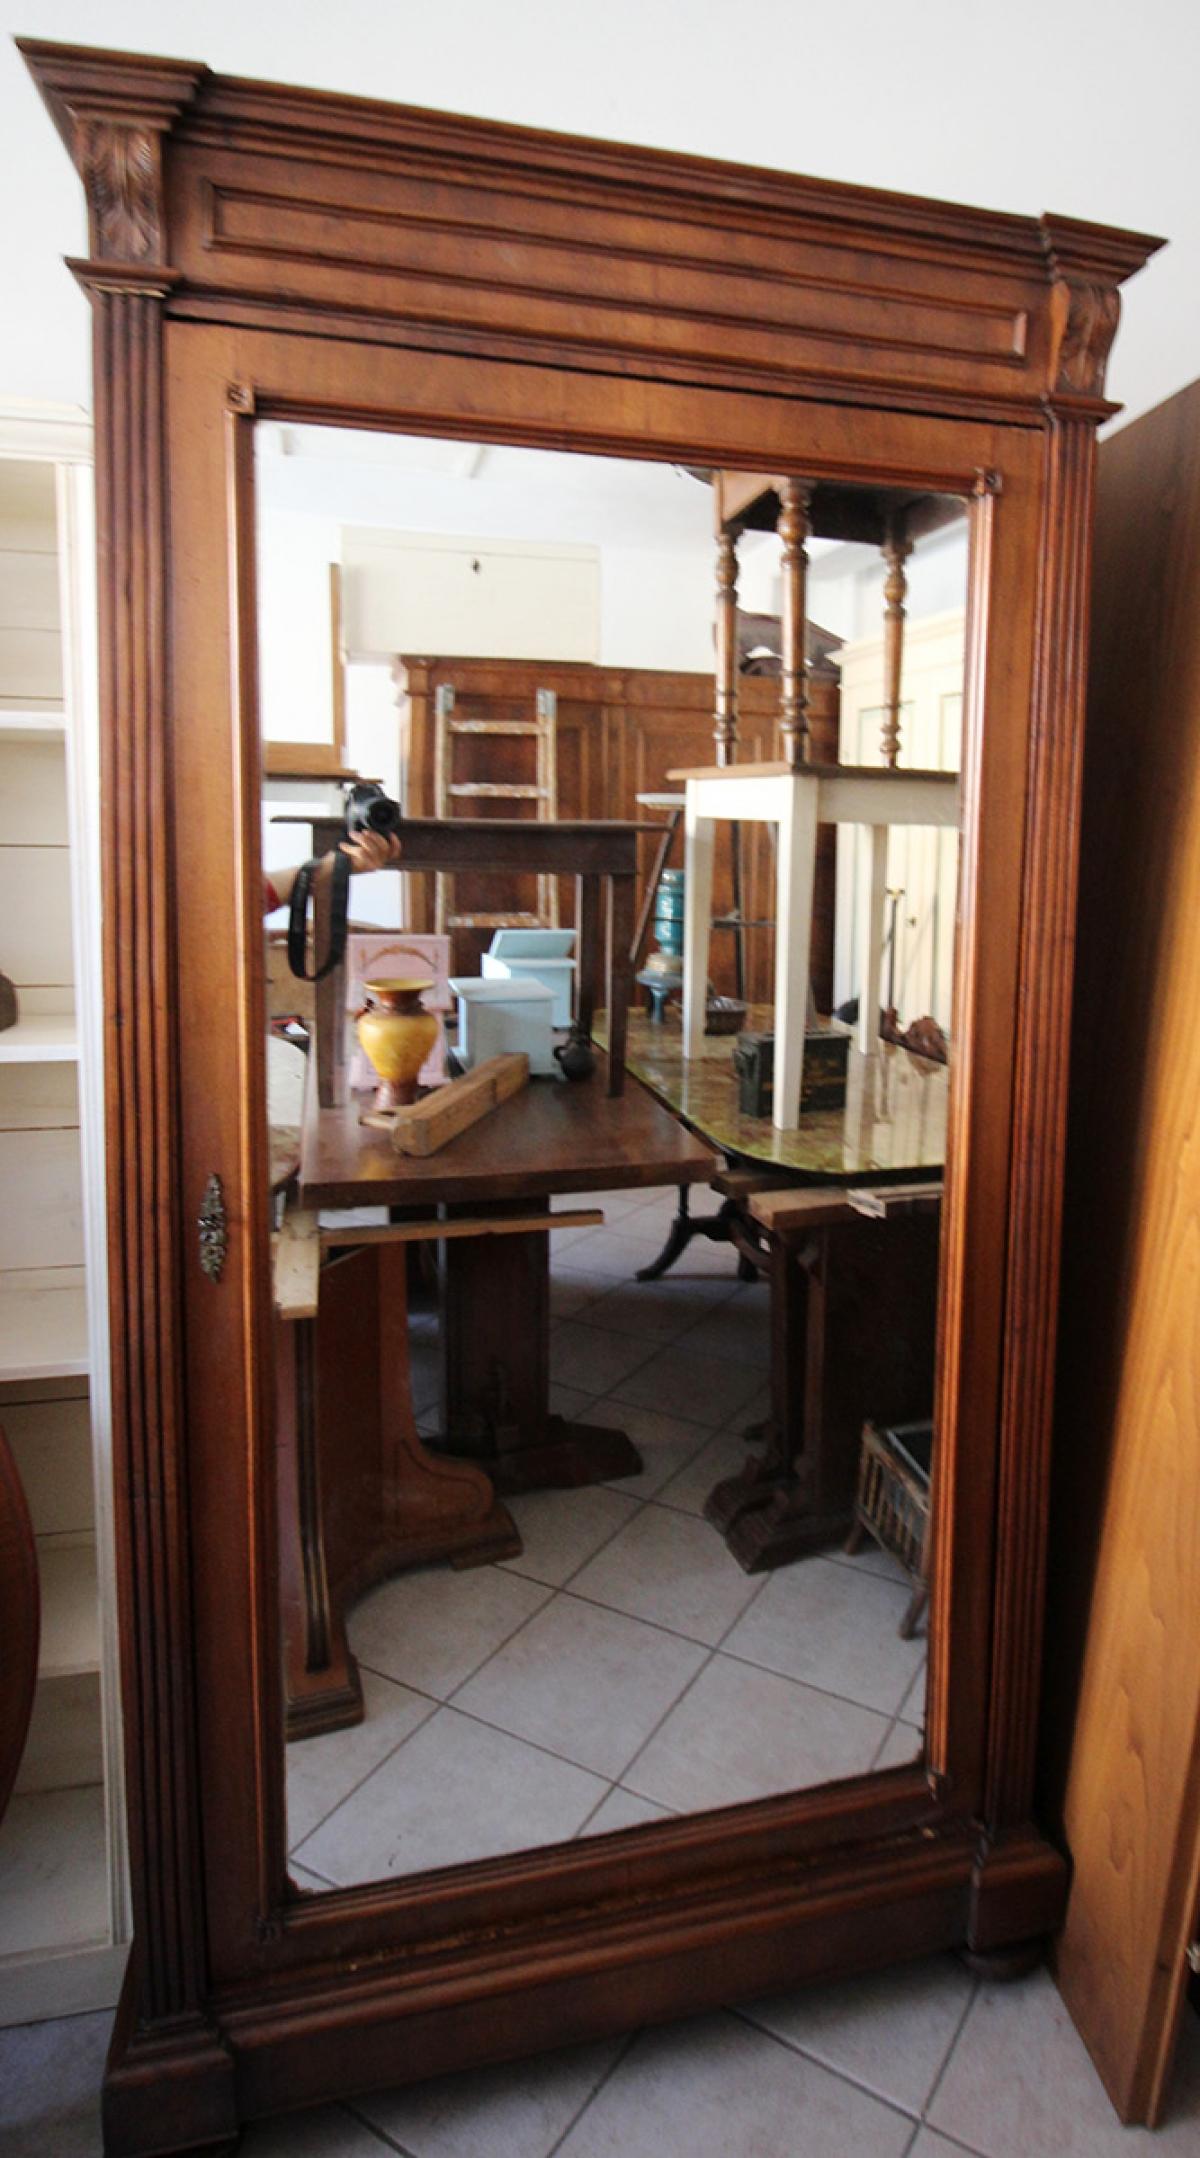 Armadio Ad Un Anta.Antichita Toscana Armadio Ad Un Anta Con Specchio